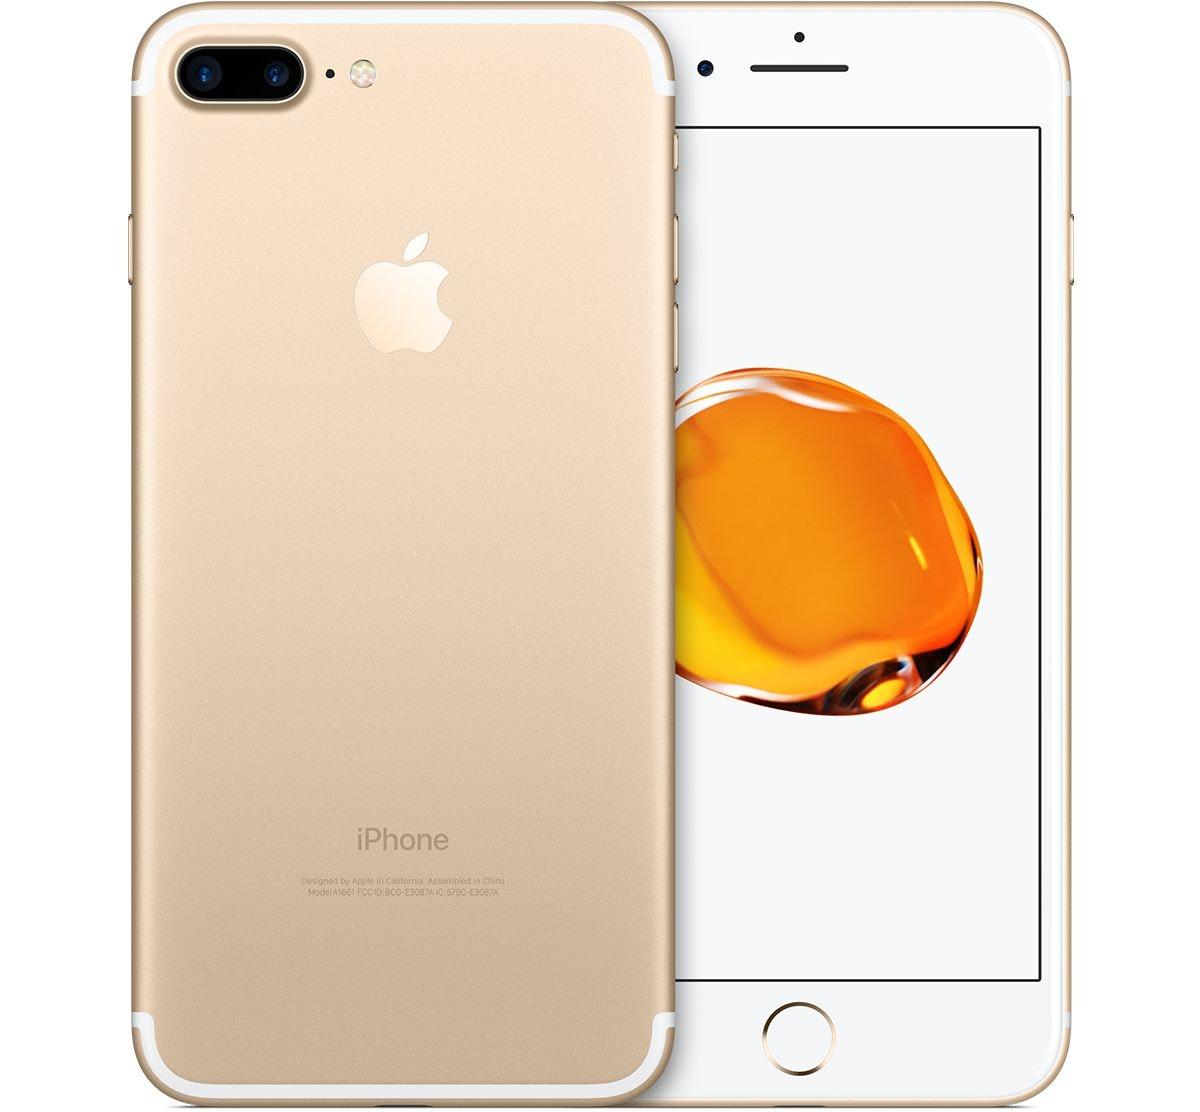 iPhone7 Plus 128GBGold Unlocked - Apple